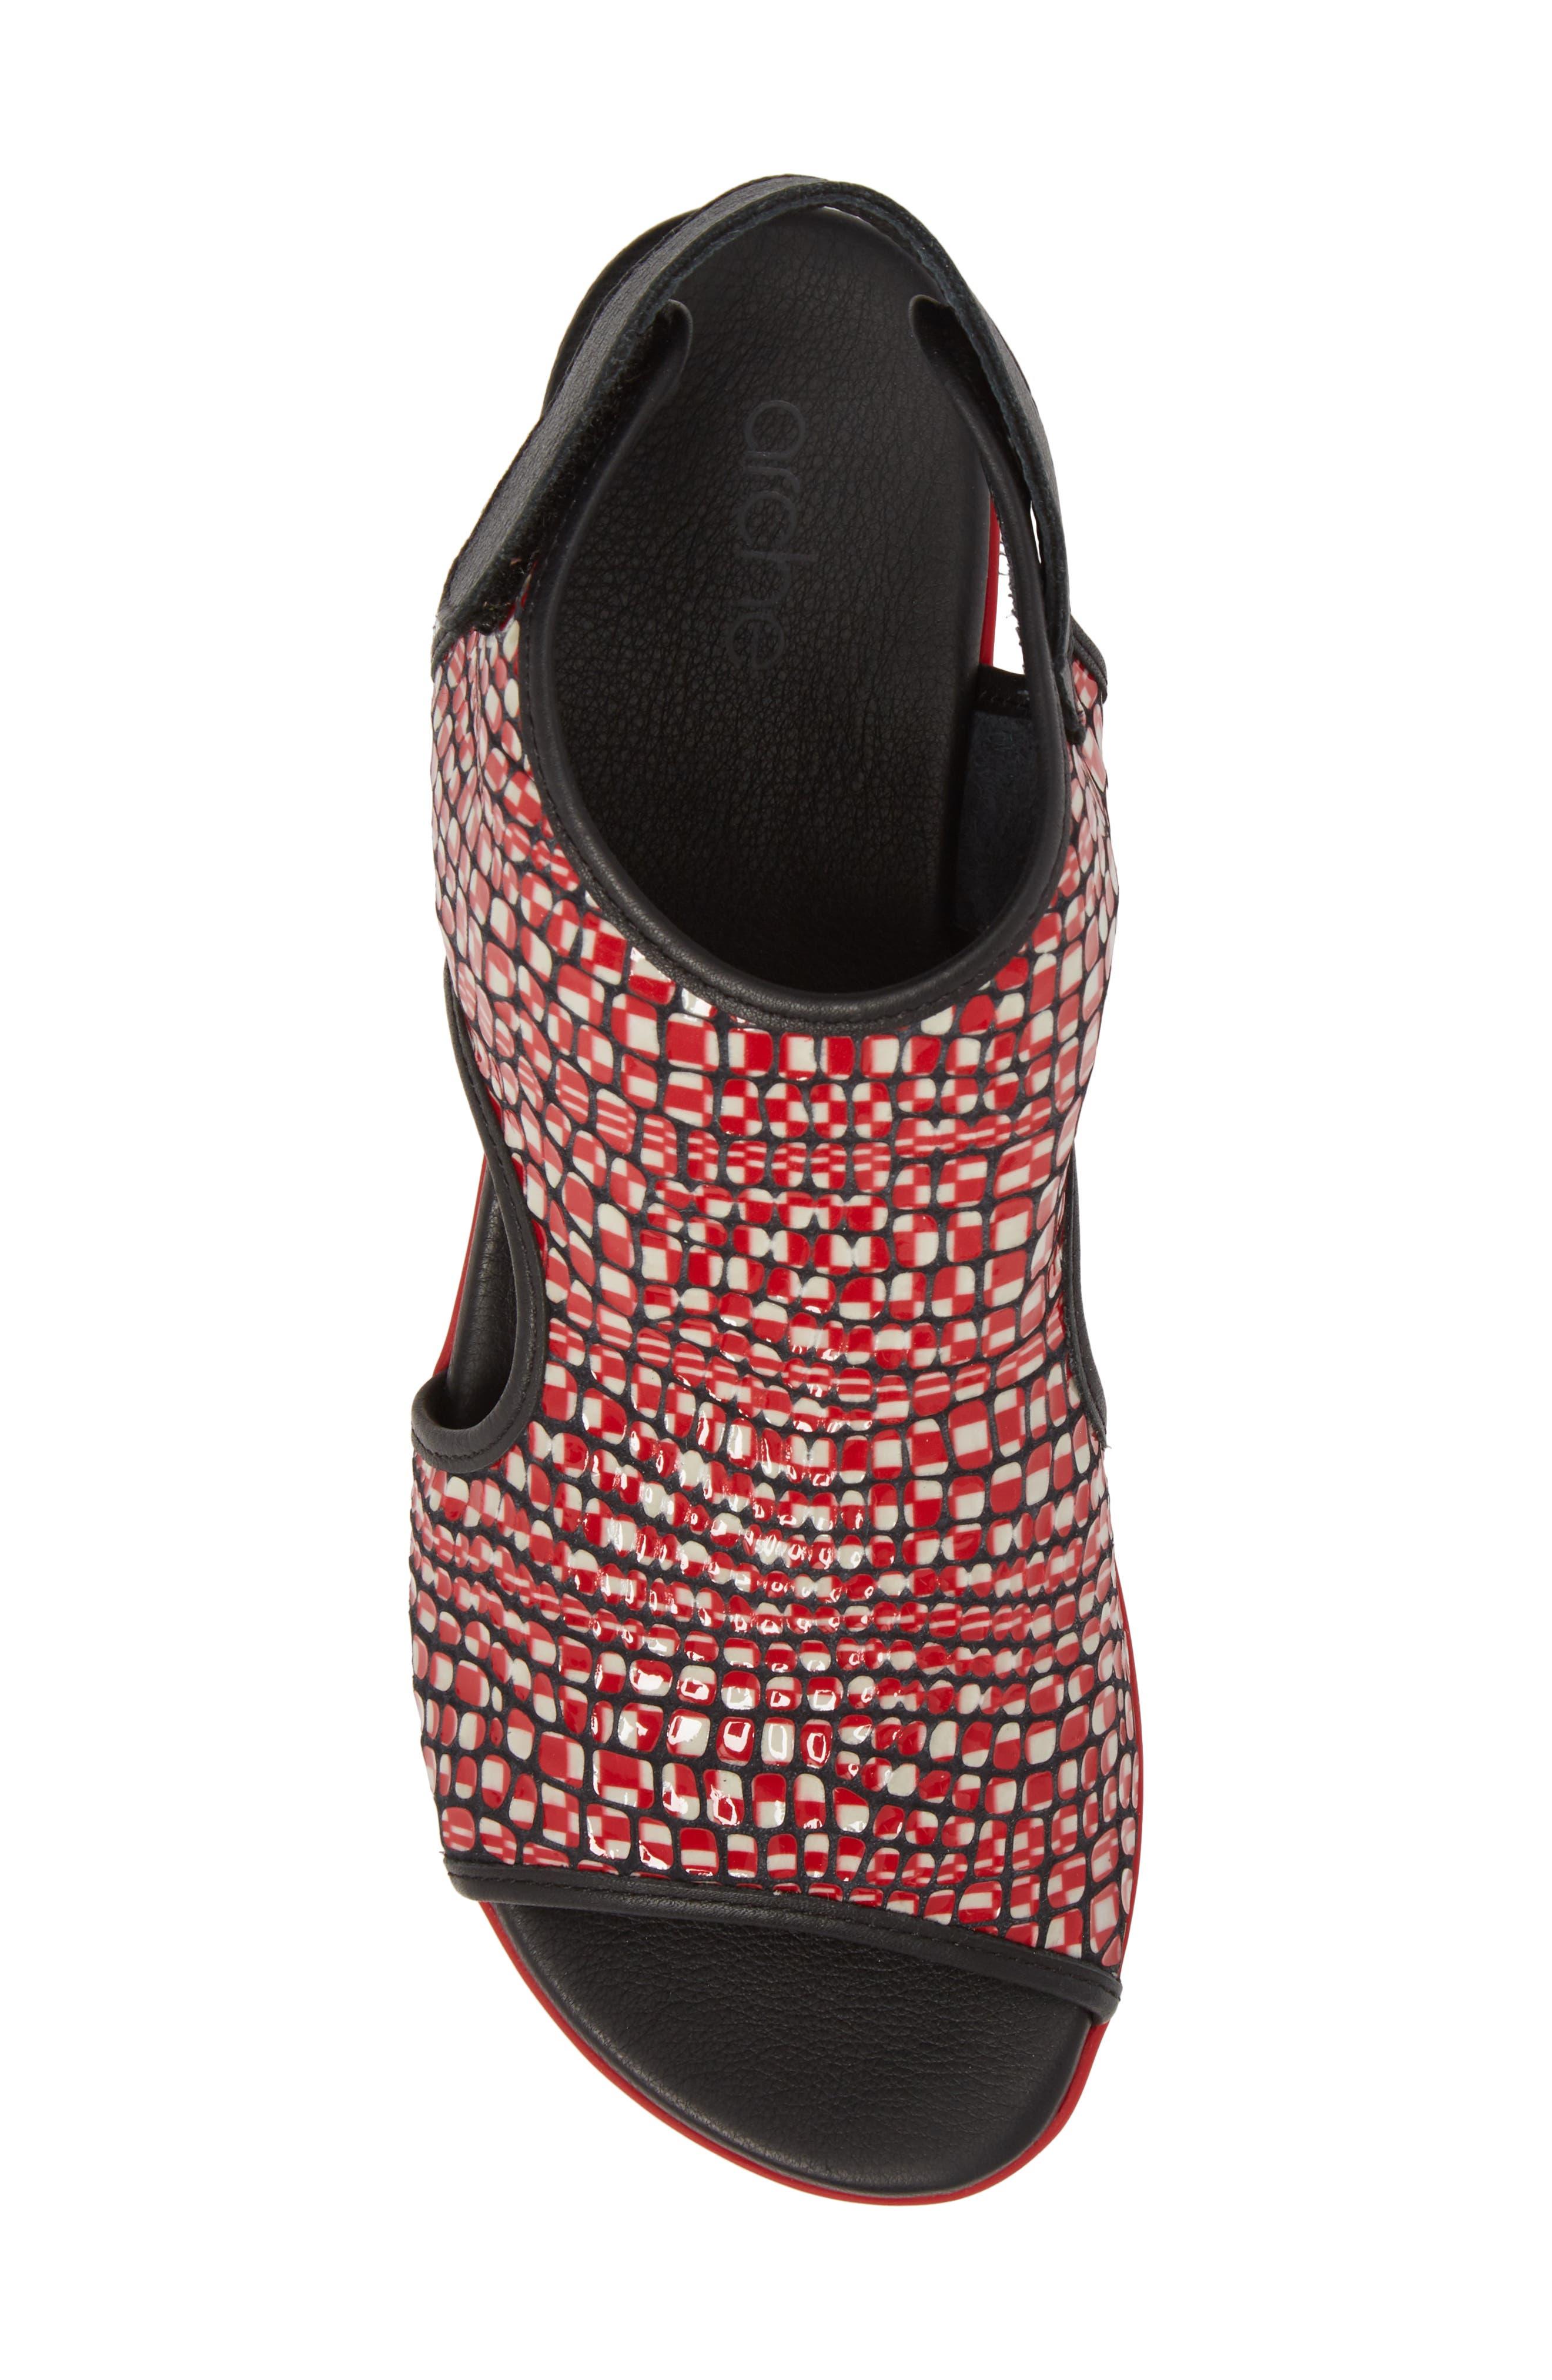 Naka Popa Wedge Sandal,                             Alternate thumbnail 5, color,                             Noir/ Rosso Leather